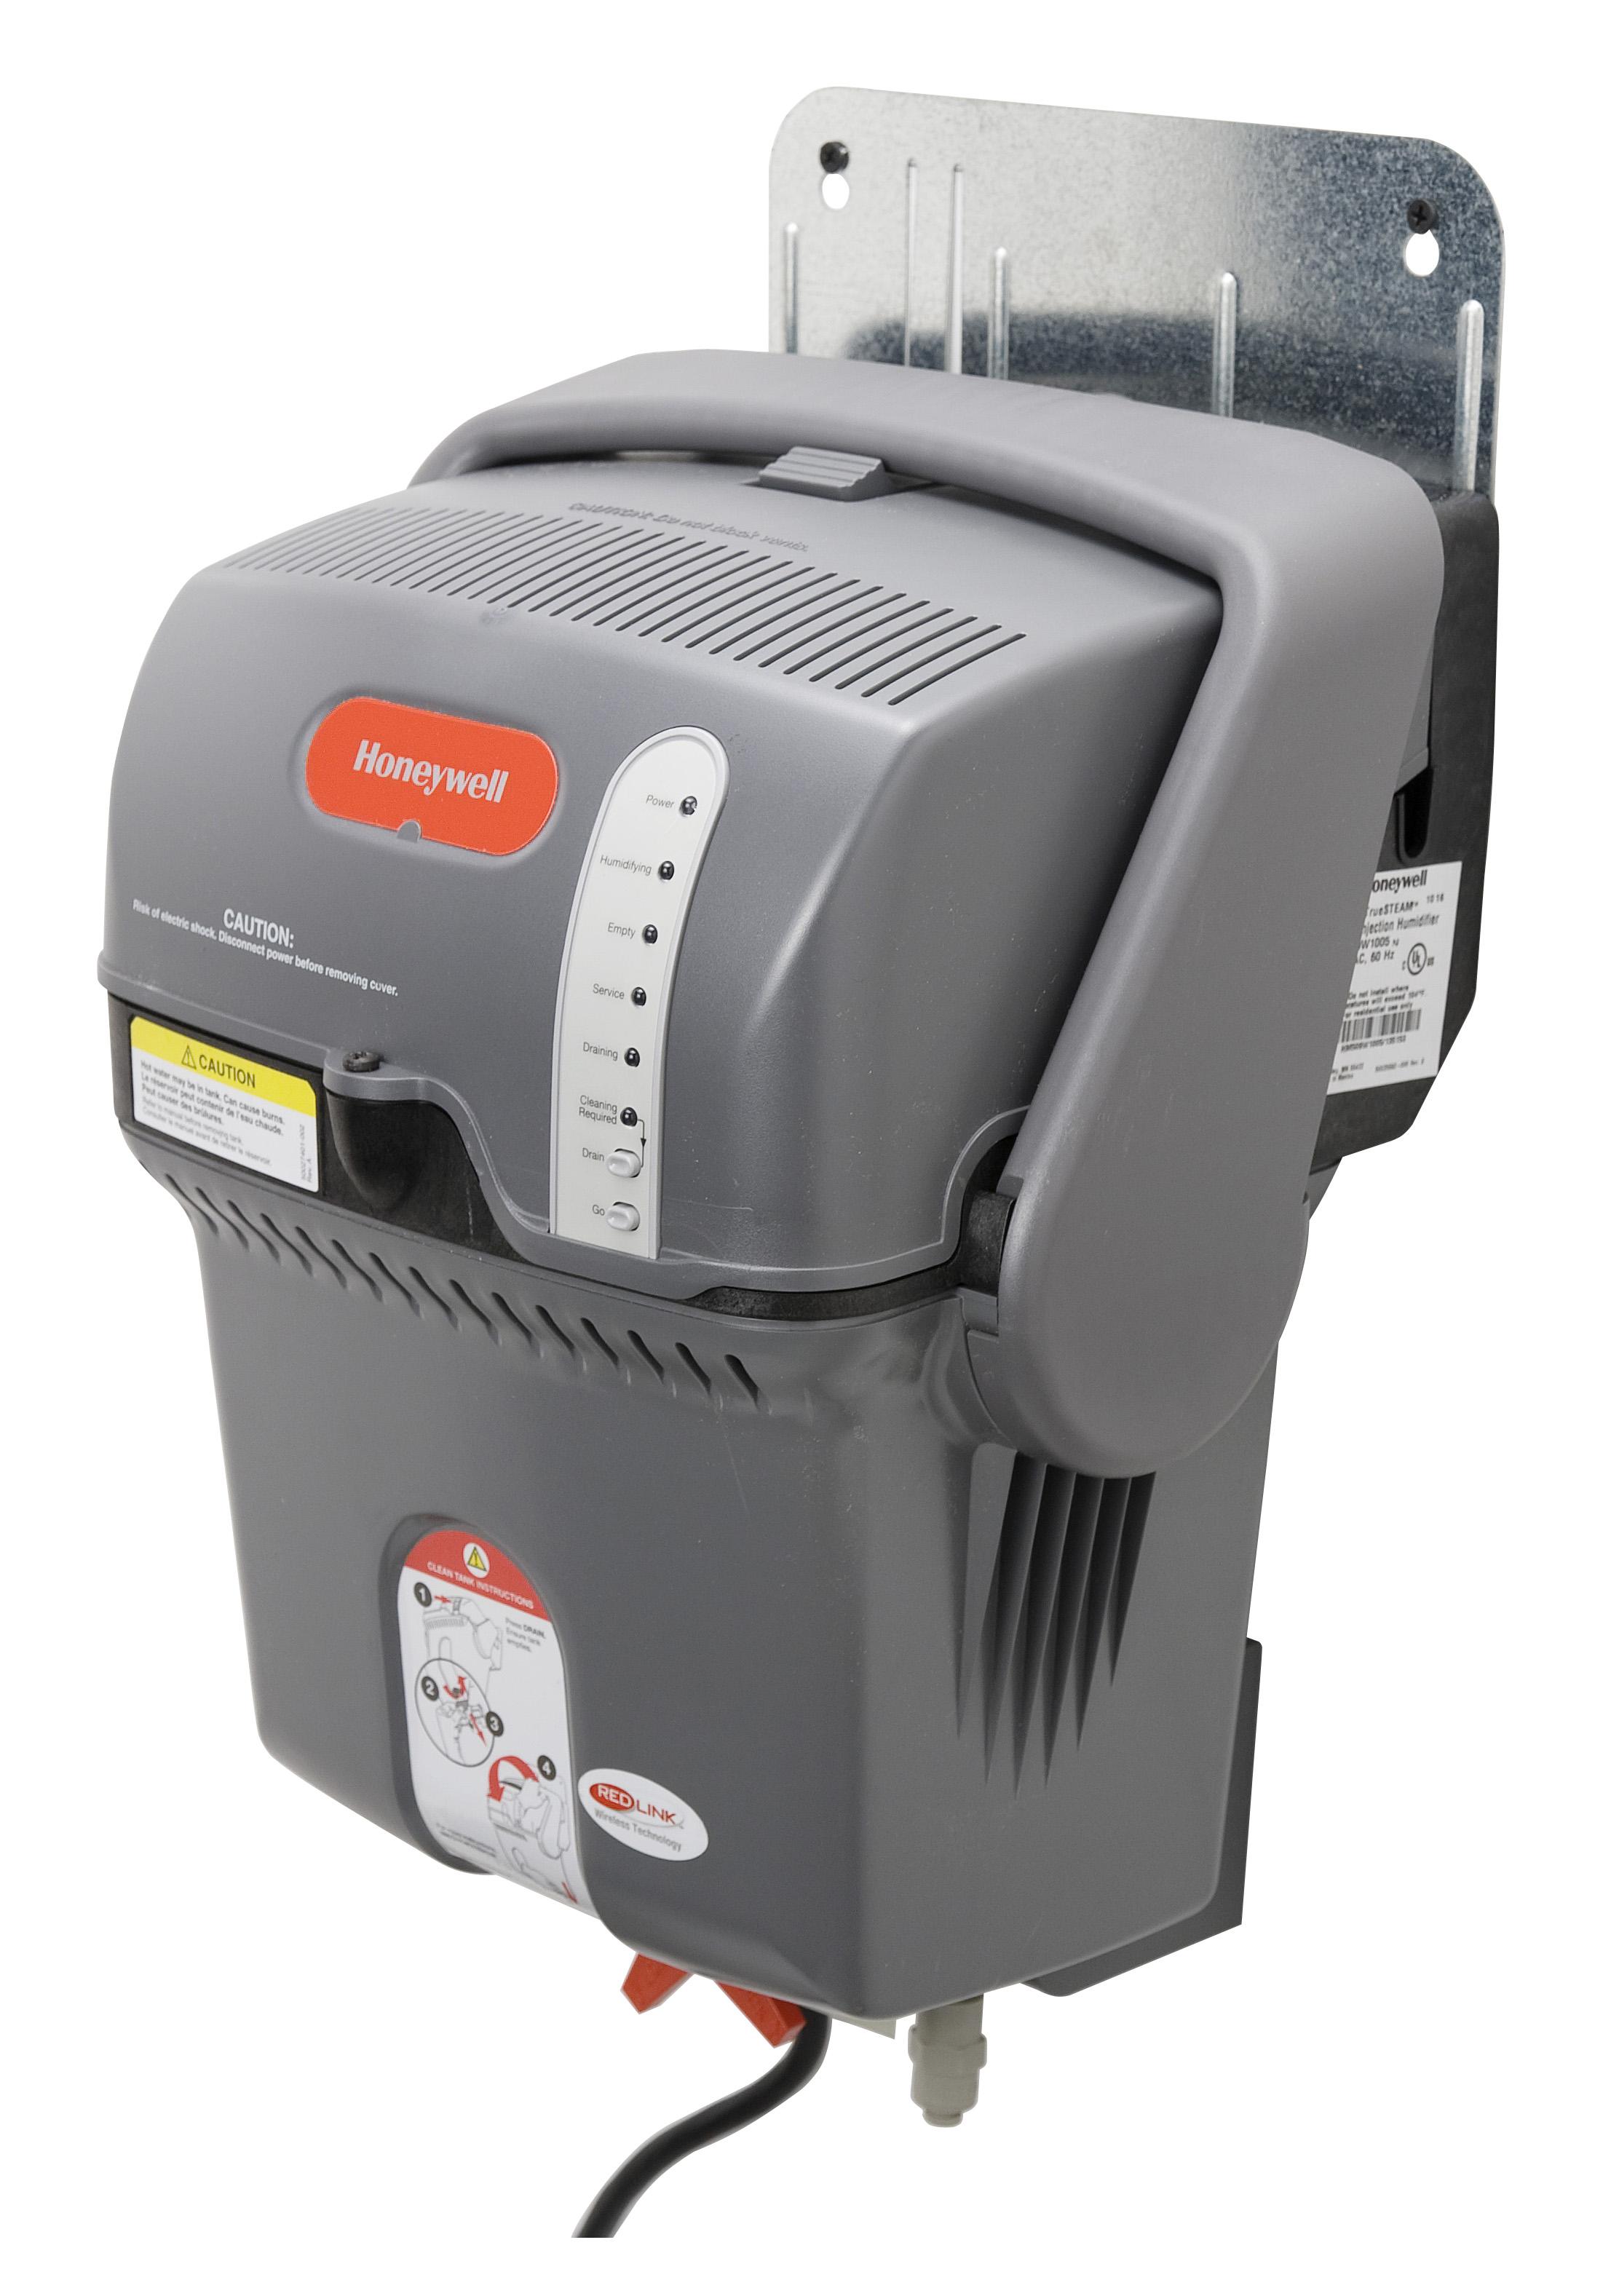 honeywell hm506a2000 instructions_brochures 6 gpd truesteam humidifier with  digital control